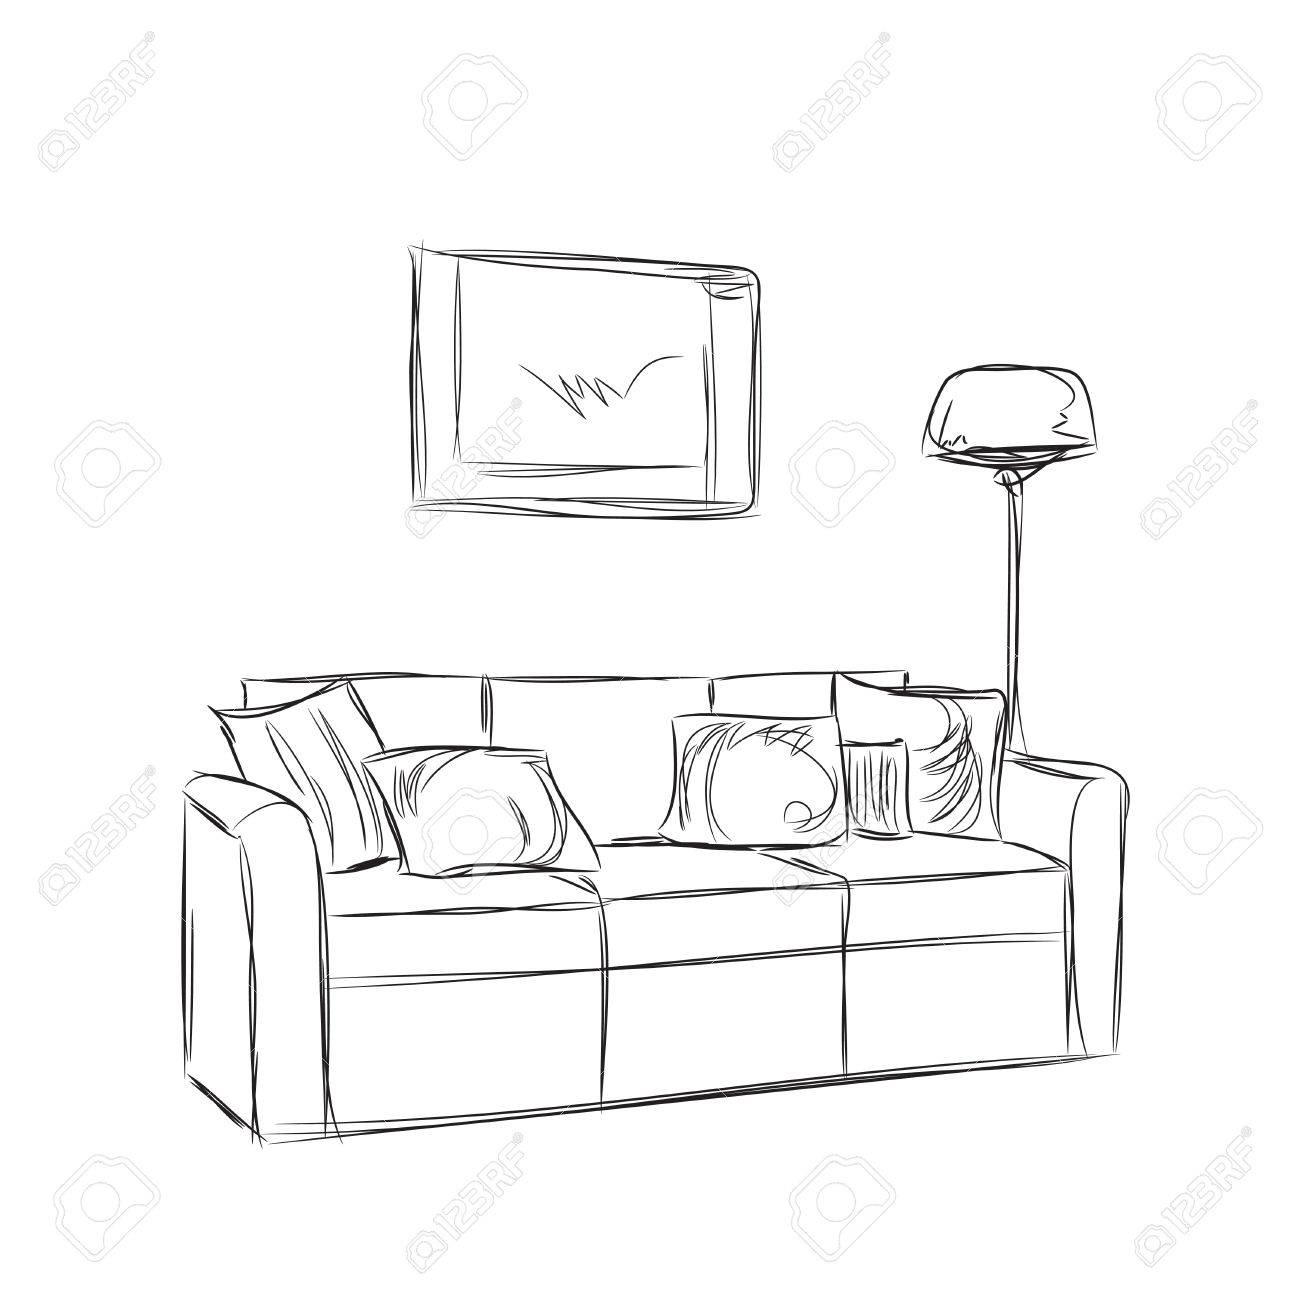 Modern Interior Room Sketch Hand Drawn Sofa Illustration Royalty